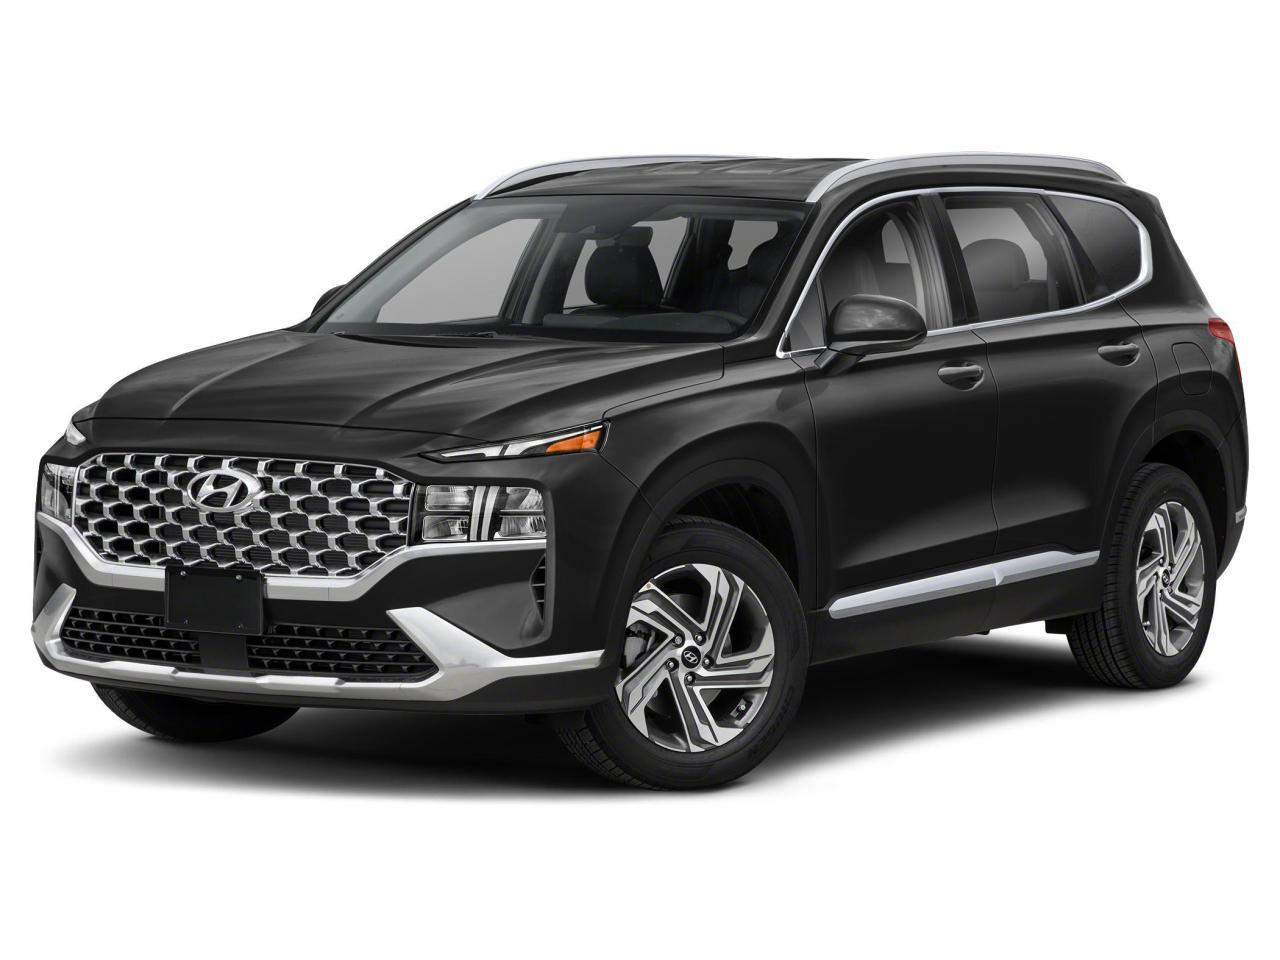 2022 Hyundai Santa Fe 2.5L PREFERRED AWD NO OPTIONS